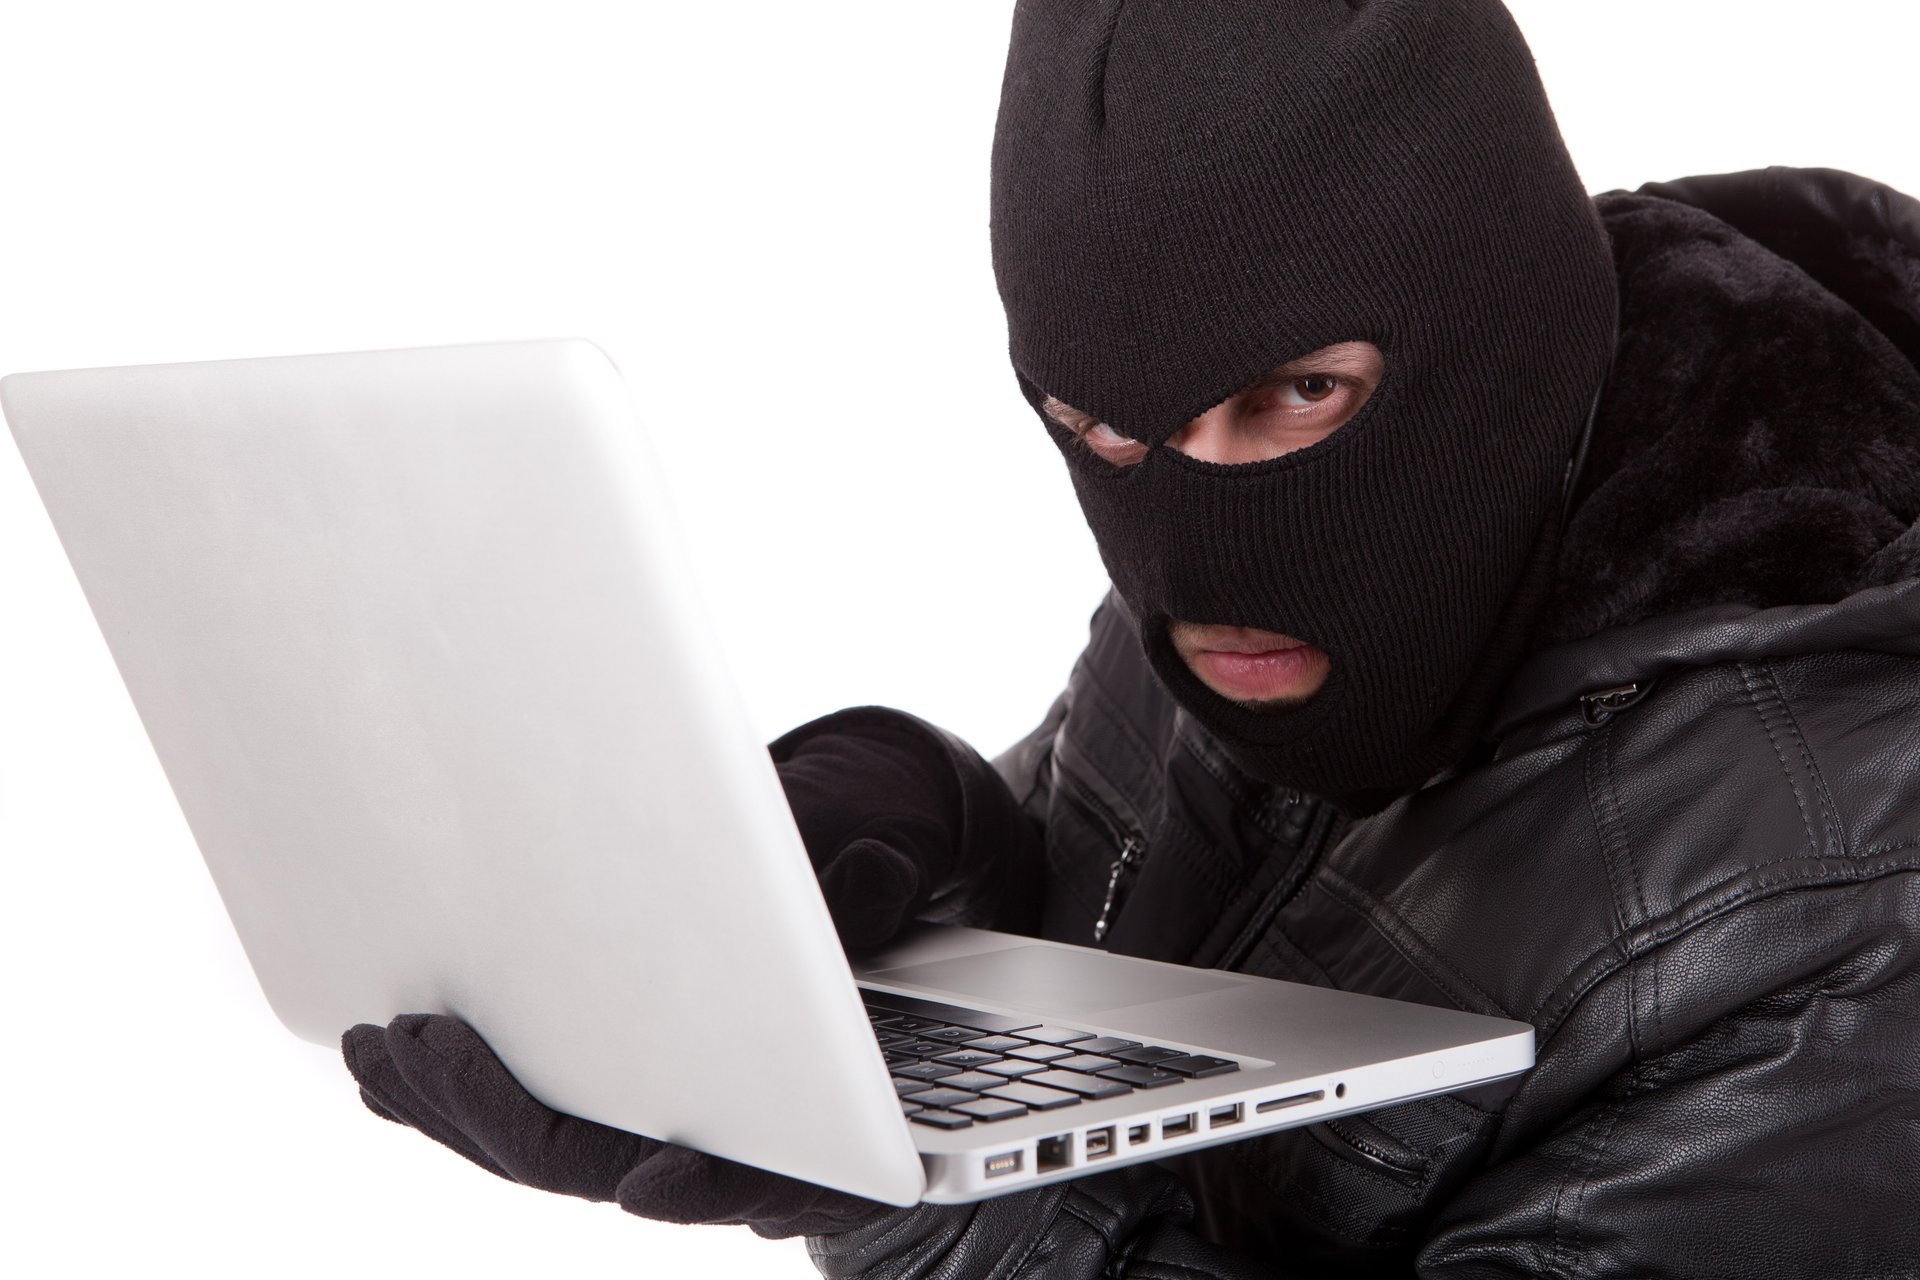 Online hacker